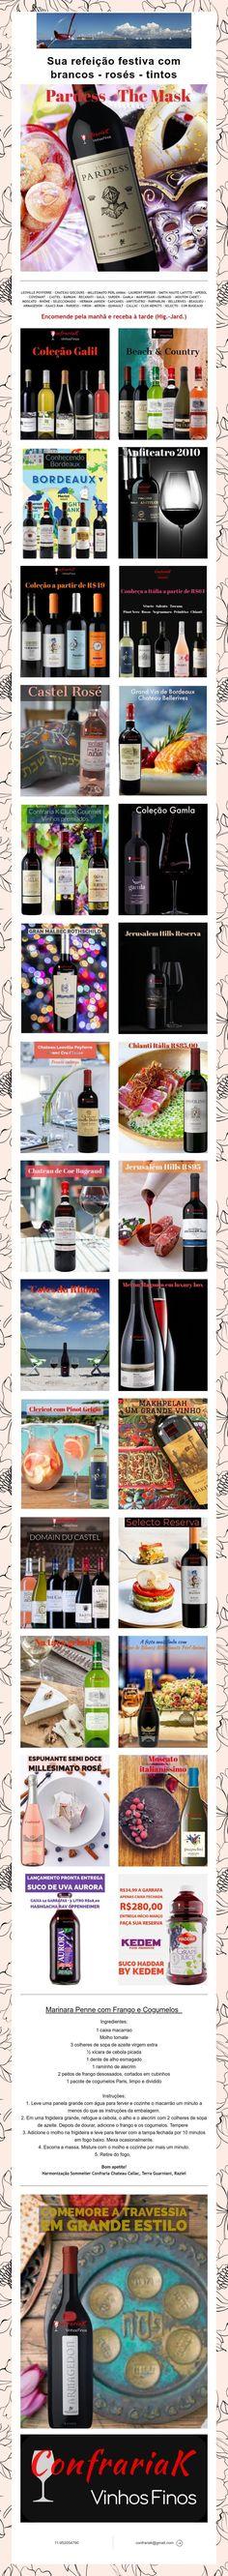 Sua refeição festiva com brancos - rosés - tintos Mouton Cadet, Laurent Perrier, White People, Wine Pairings